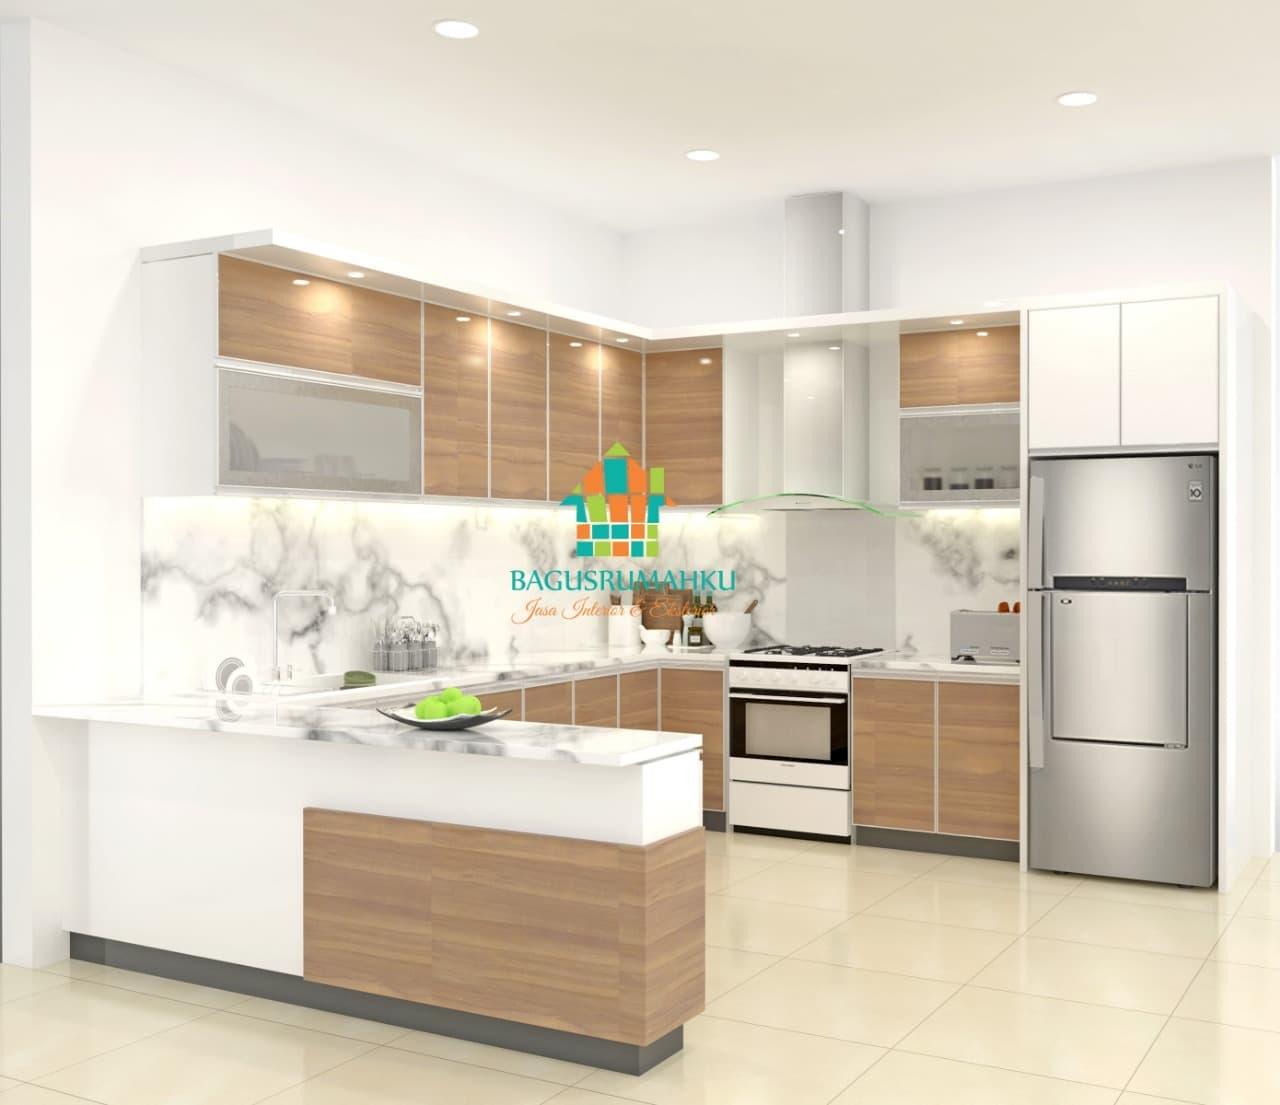 Jual custome furniture bagusrumahku kitchen set mewah kab purwakarta astri bagusrumahku tokopedia